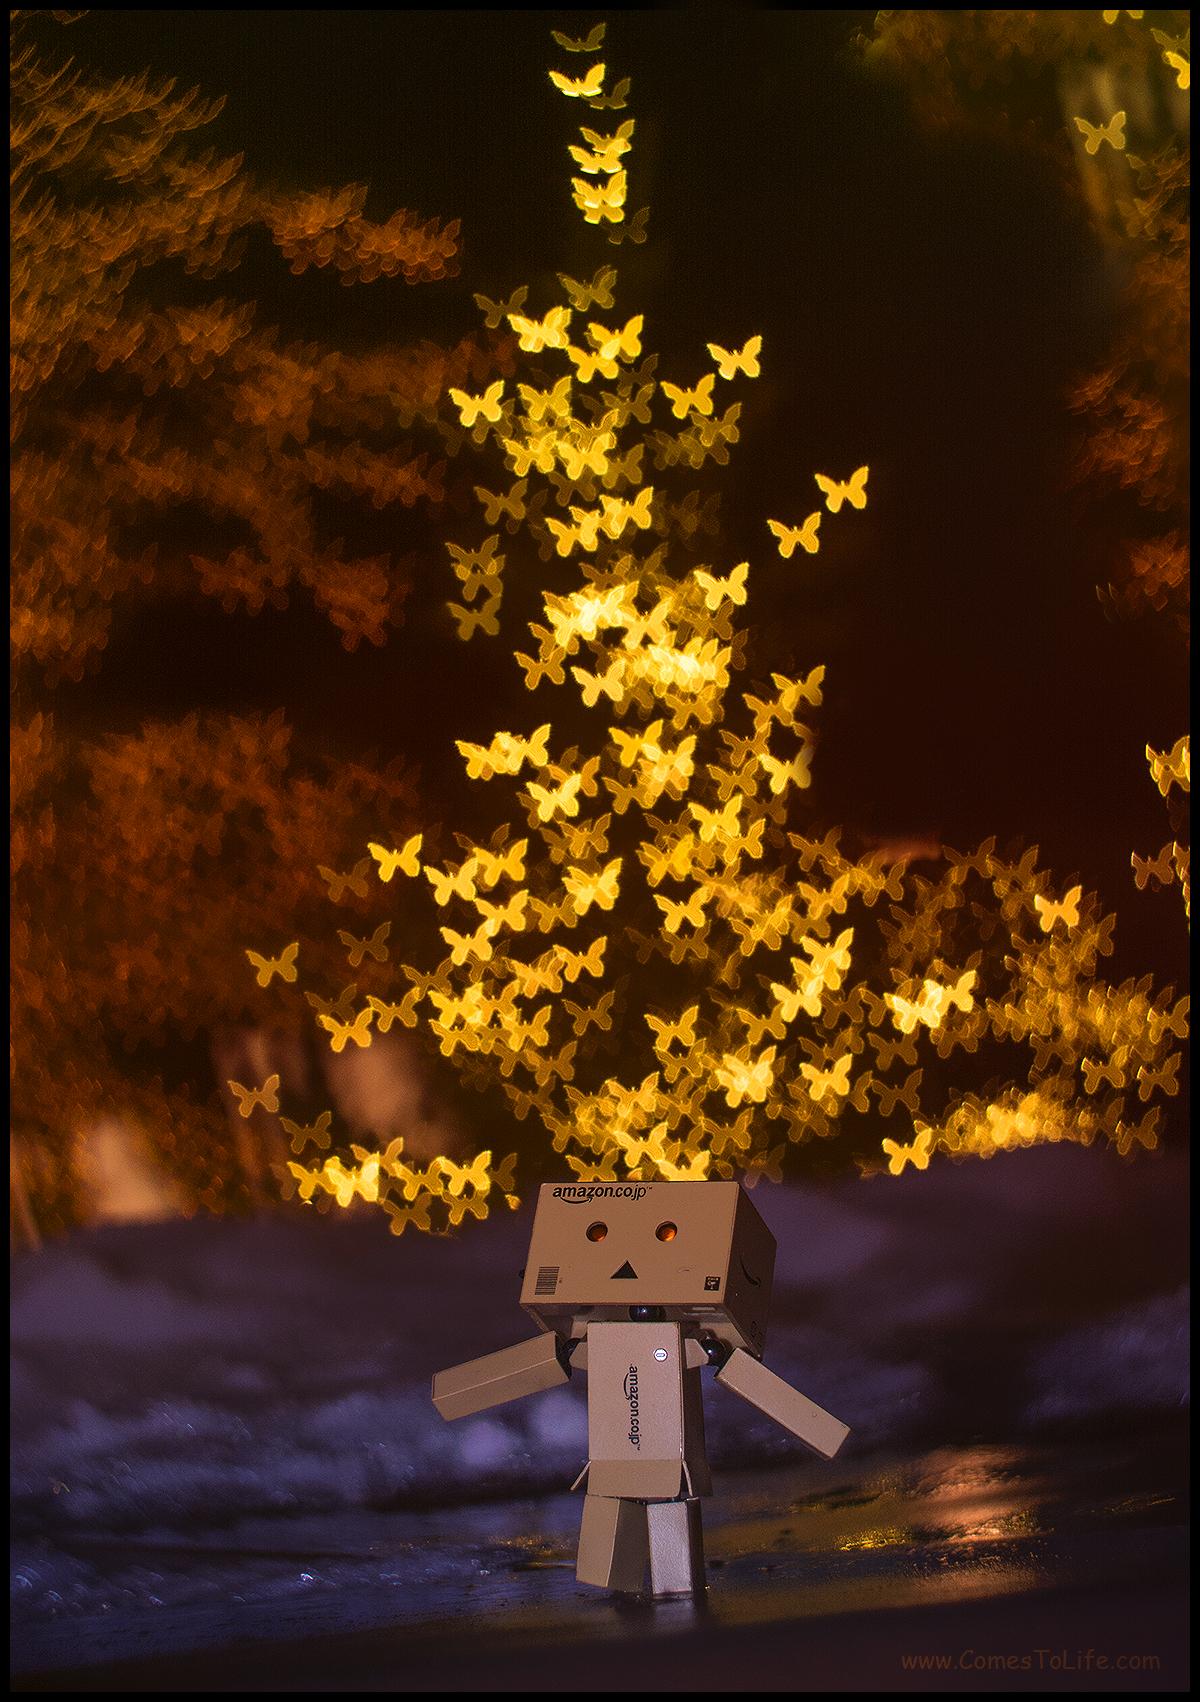 ButterflyEffect2_ComesToLifeCOM